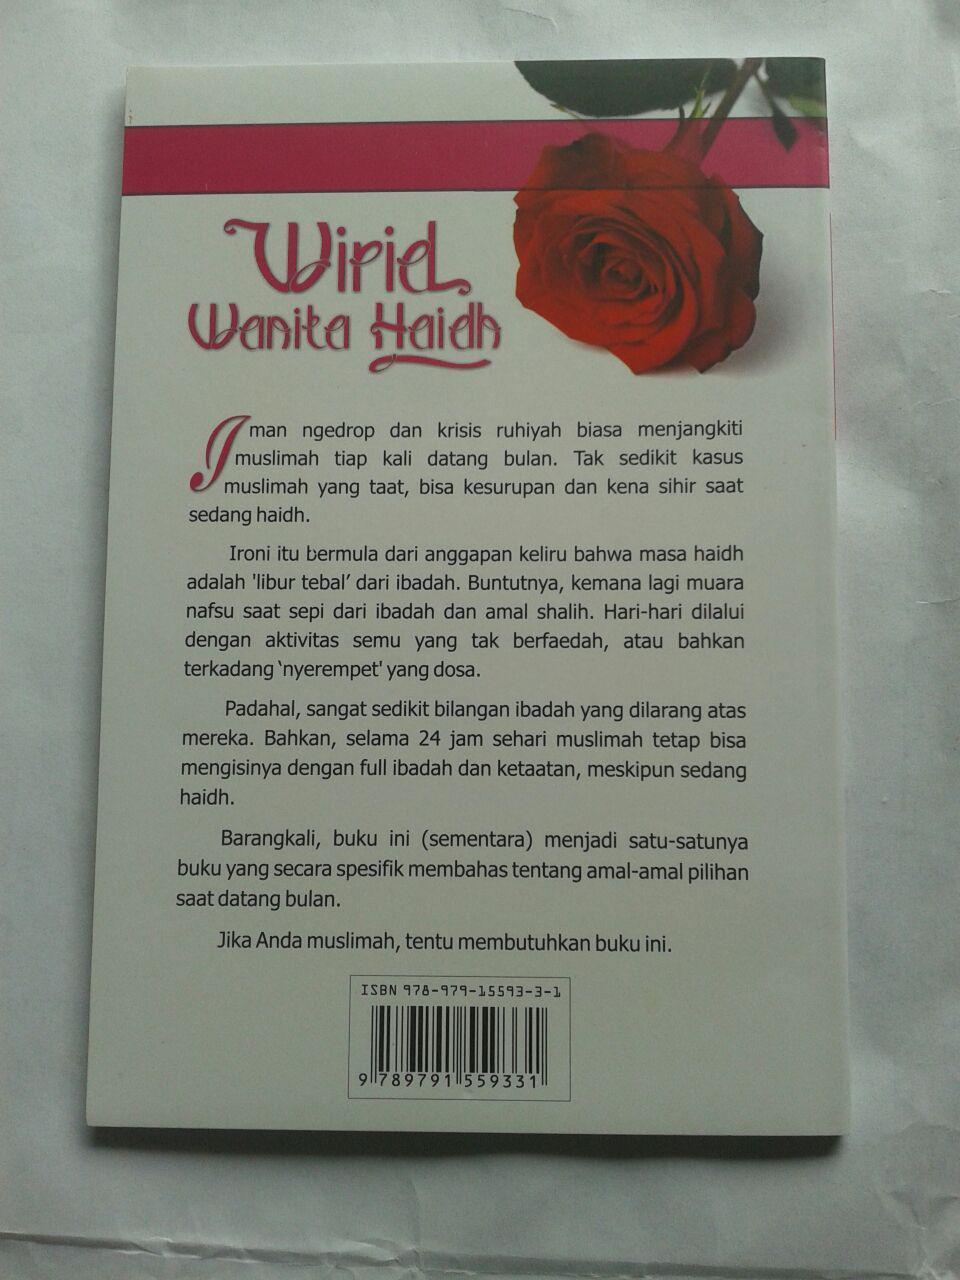 Buku Wirid Wanita Haidh Amal Pilihan Saat Datang Bulan cover 2